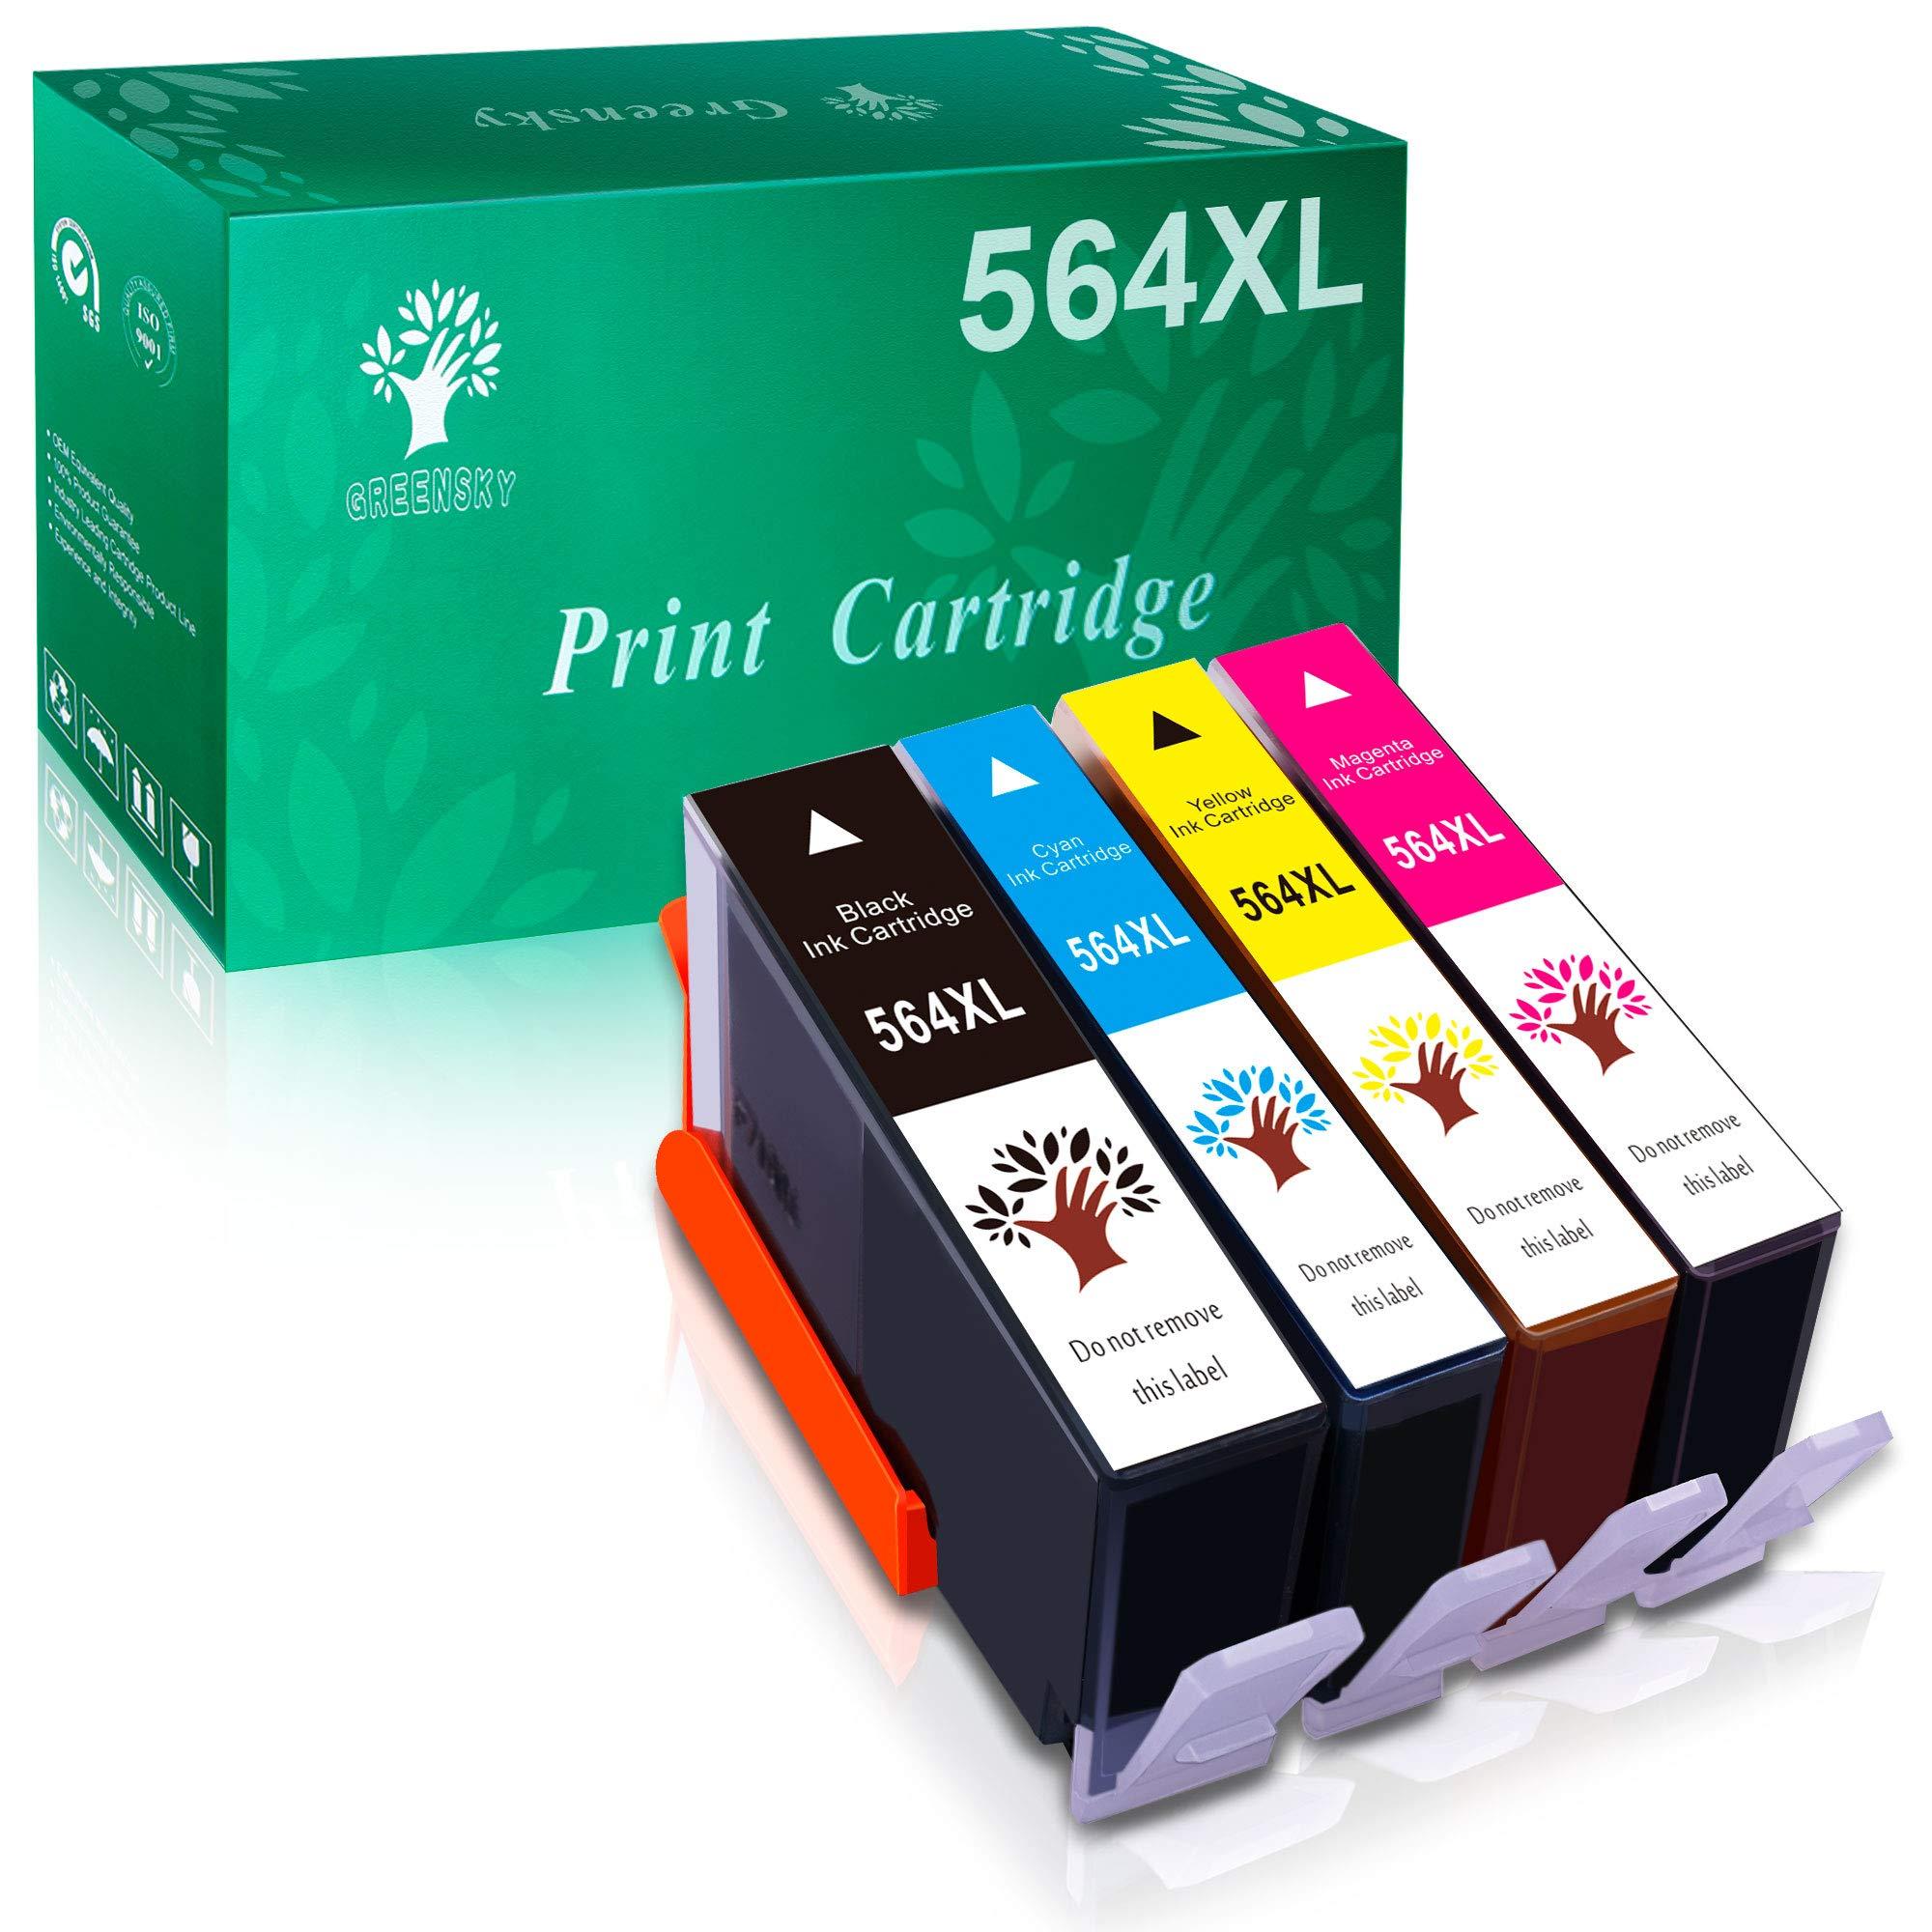 GREENSKY Compatible Ink Cartridges Replacement for HP 564XL for HP DeskJet 3520 3522 OfficeJet 4620 PhotoSmart 5510 5514 5520 6520 6525 7510 7520 7525 C309a C410a C5370 C5380 C6380 Printer, 4 Packs